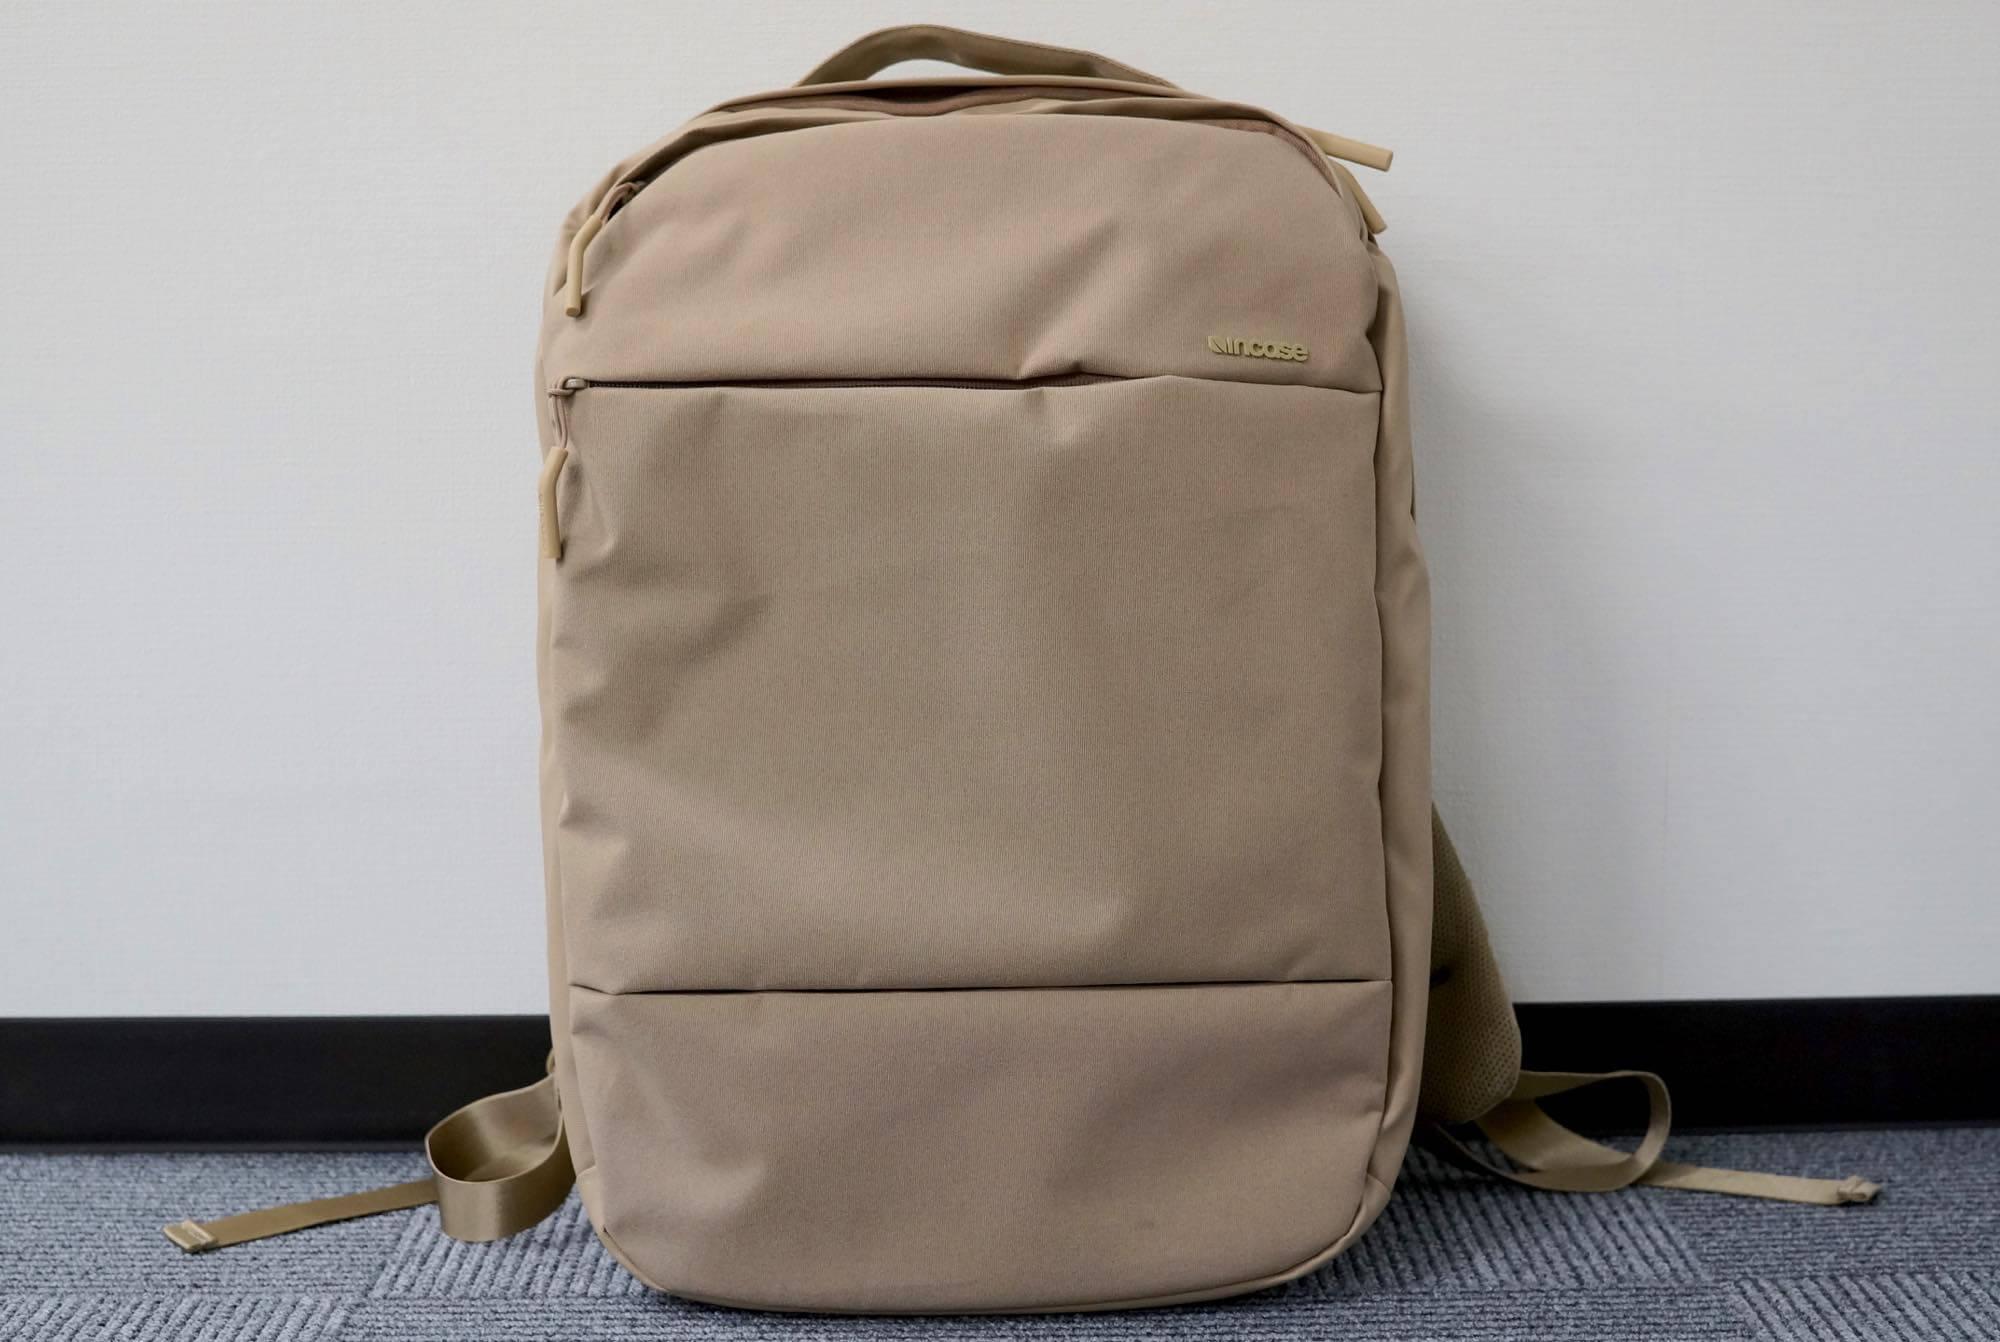 incase-city-collection-compact8